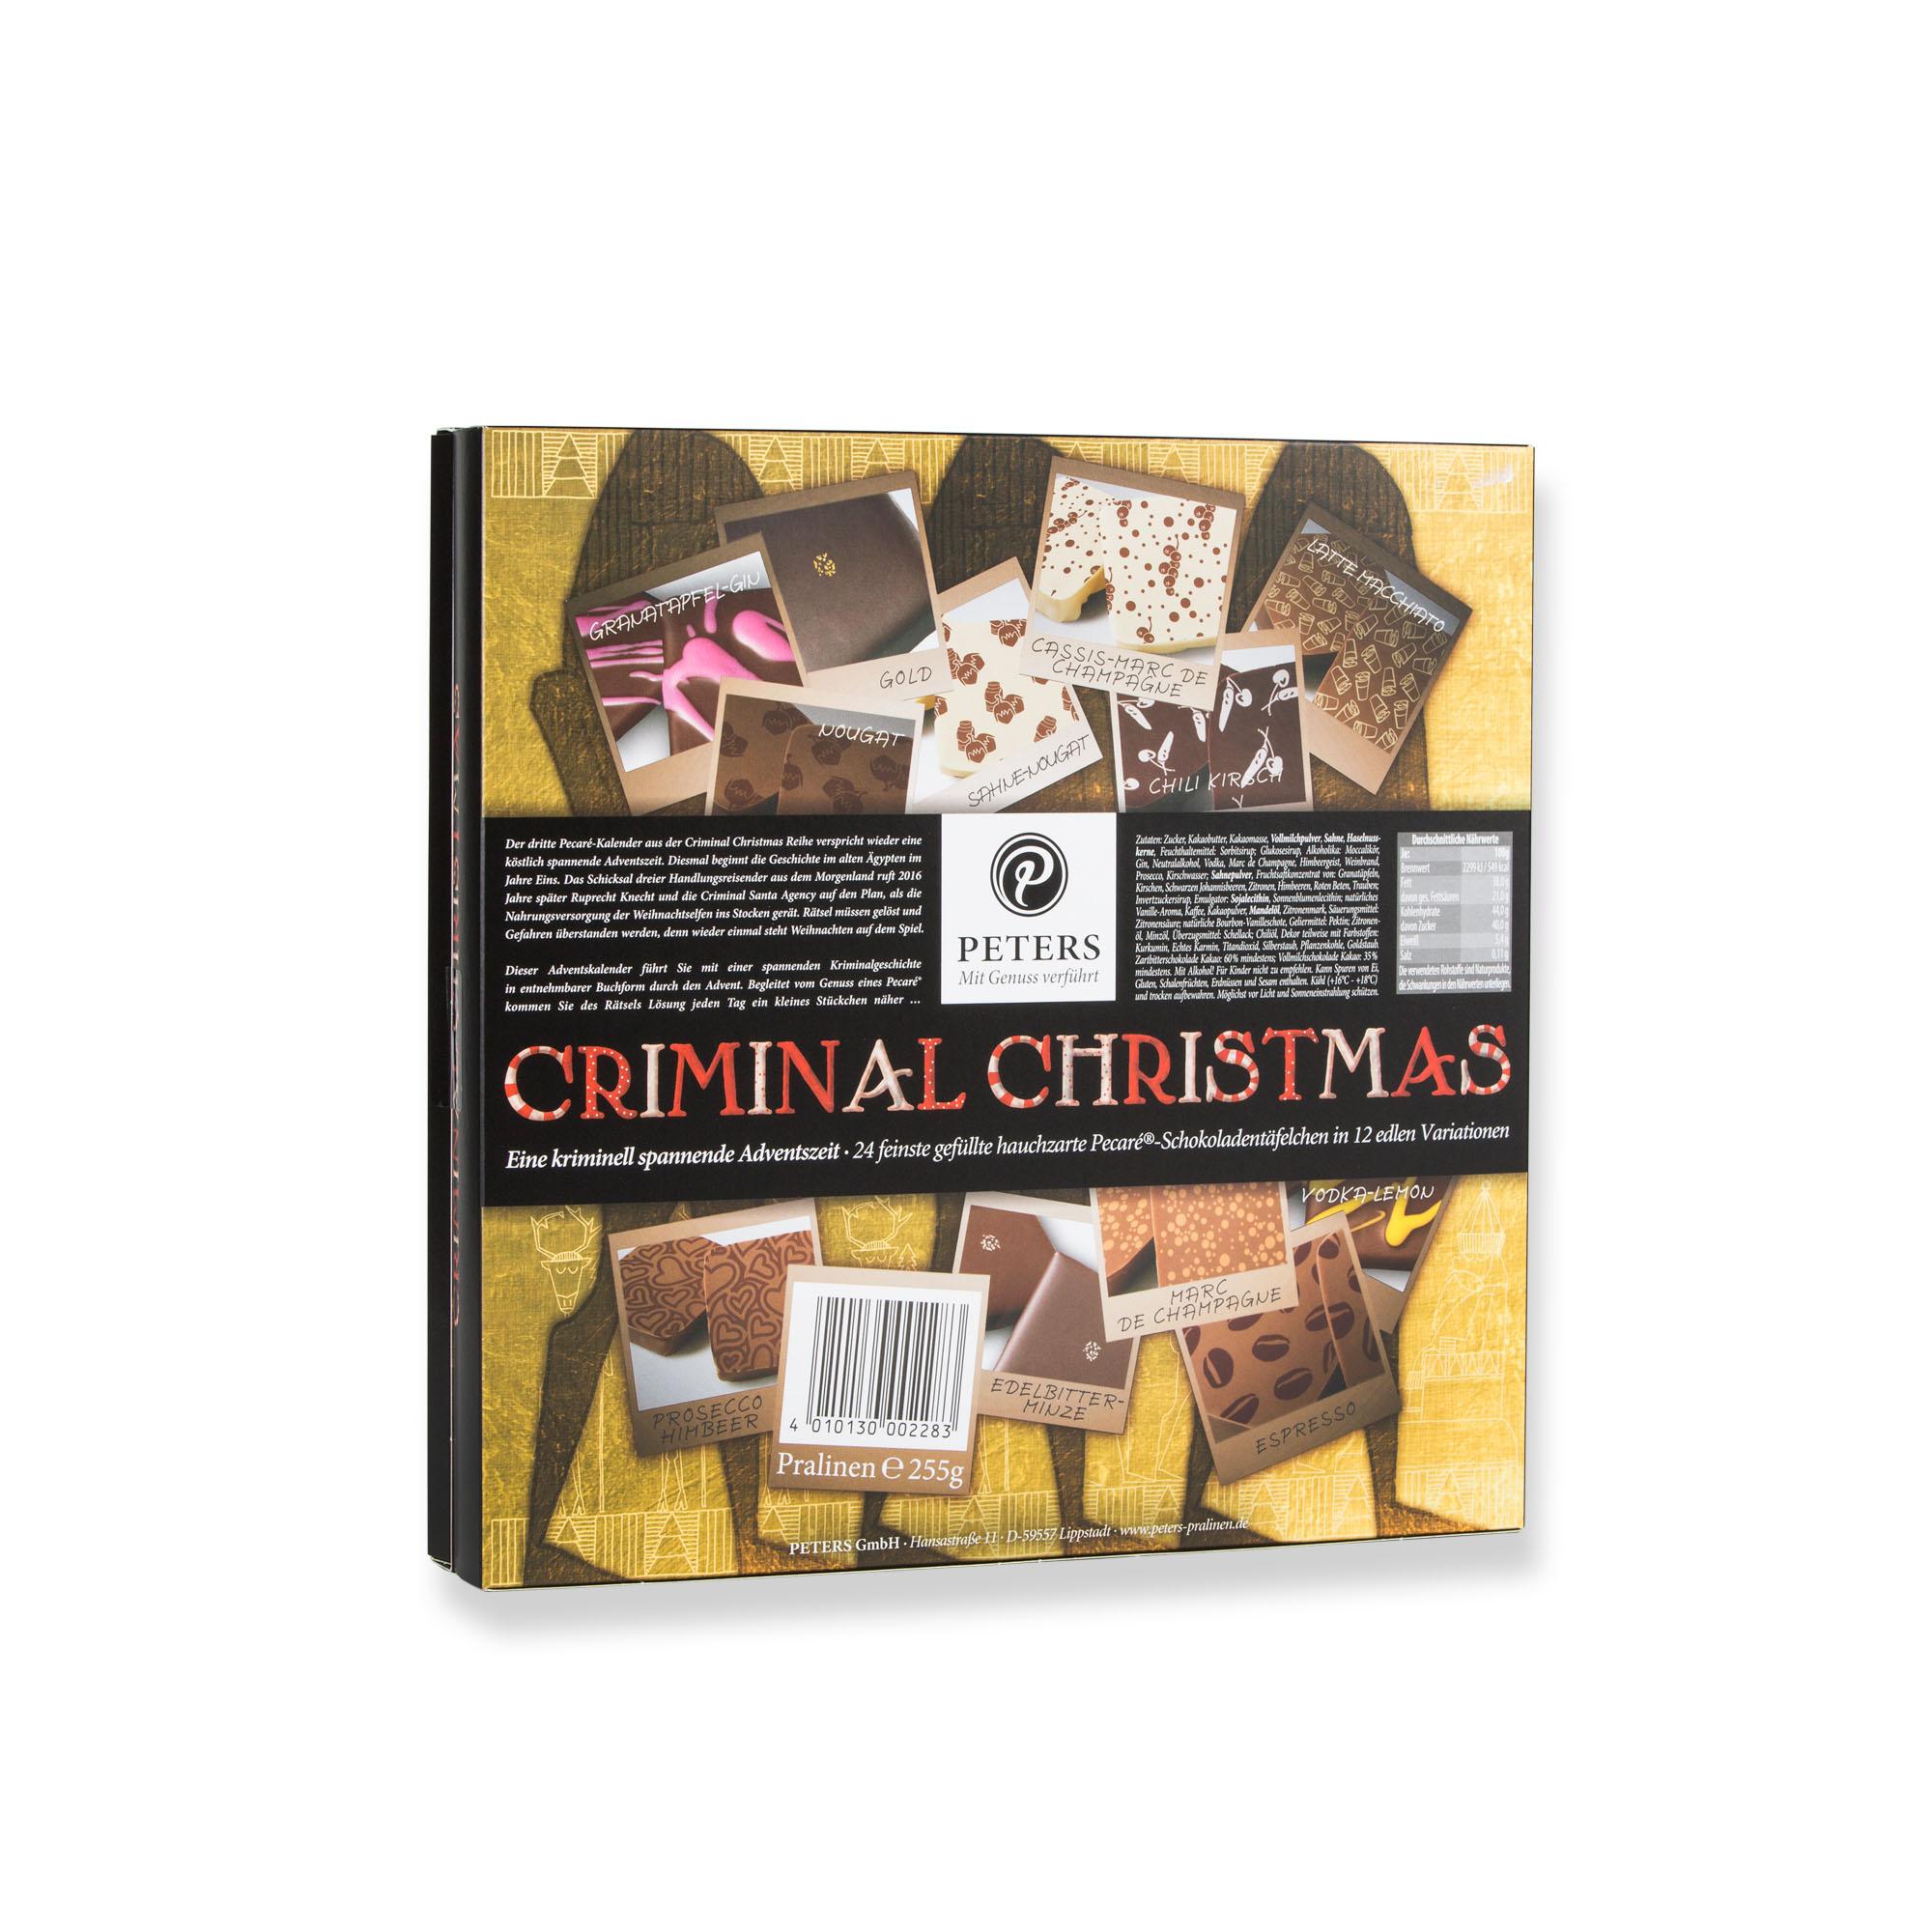 Alte Weihnachtskalender.Criminal Christmas The Stollen Scandal Advent Calendar With Book